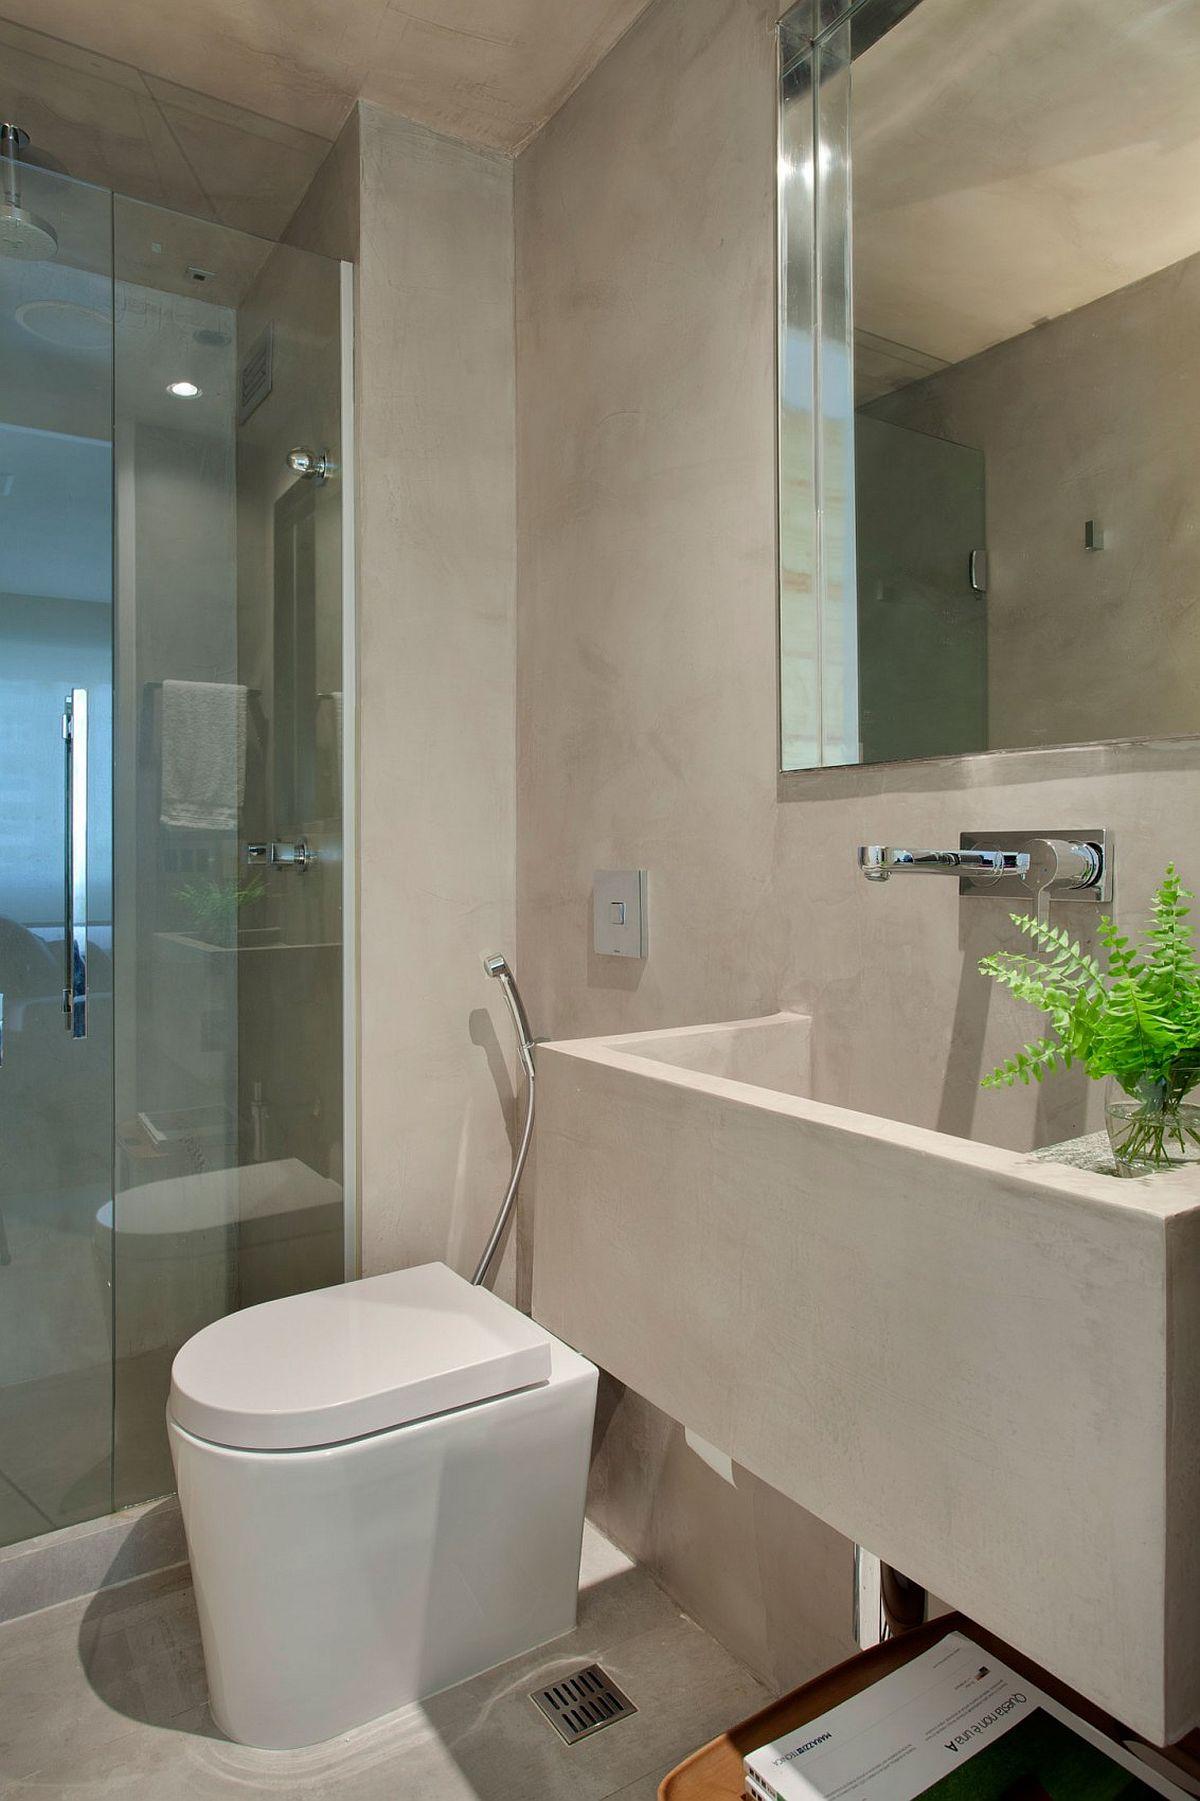 Small bathroom design with corner shower